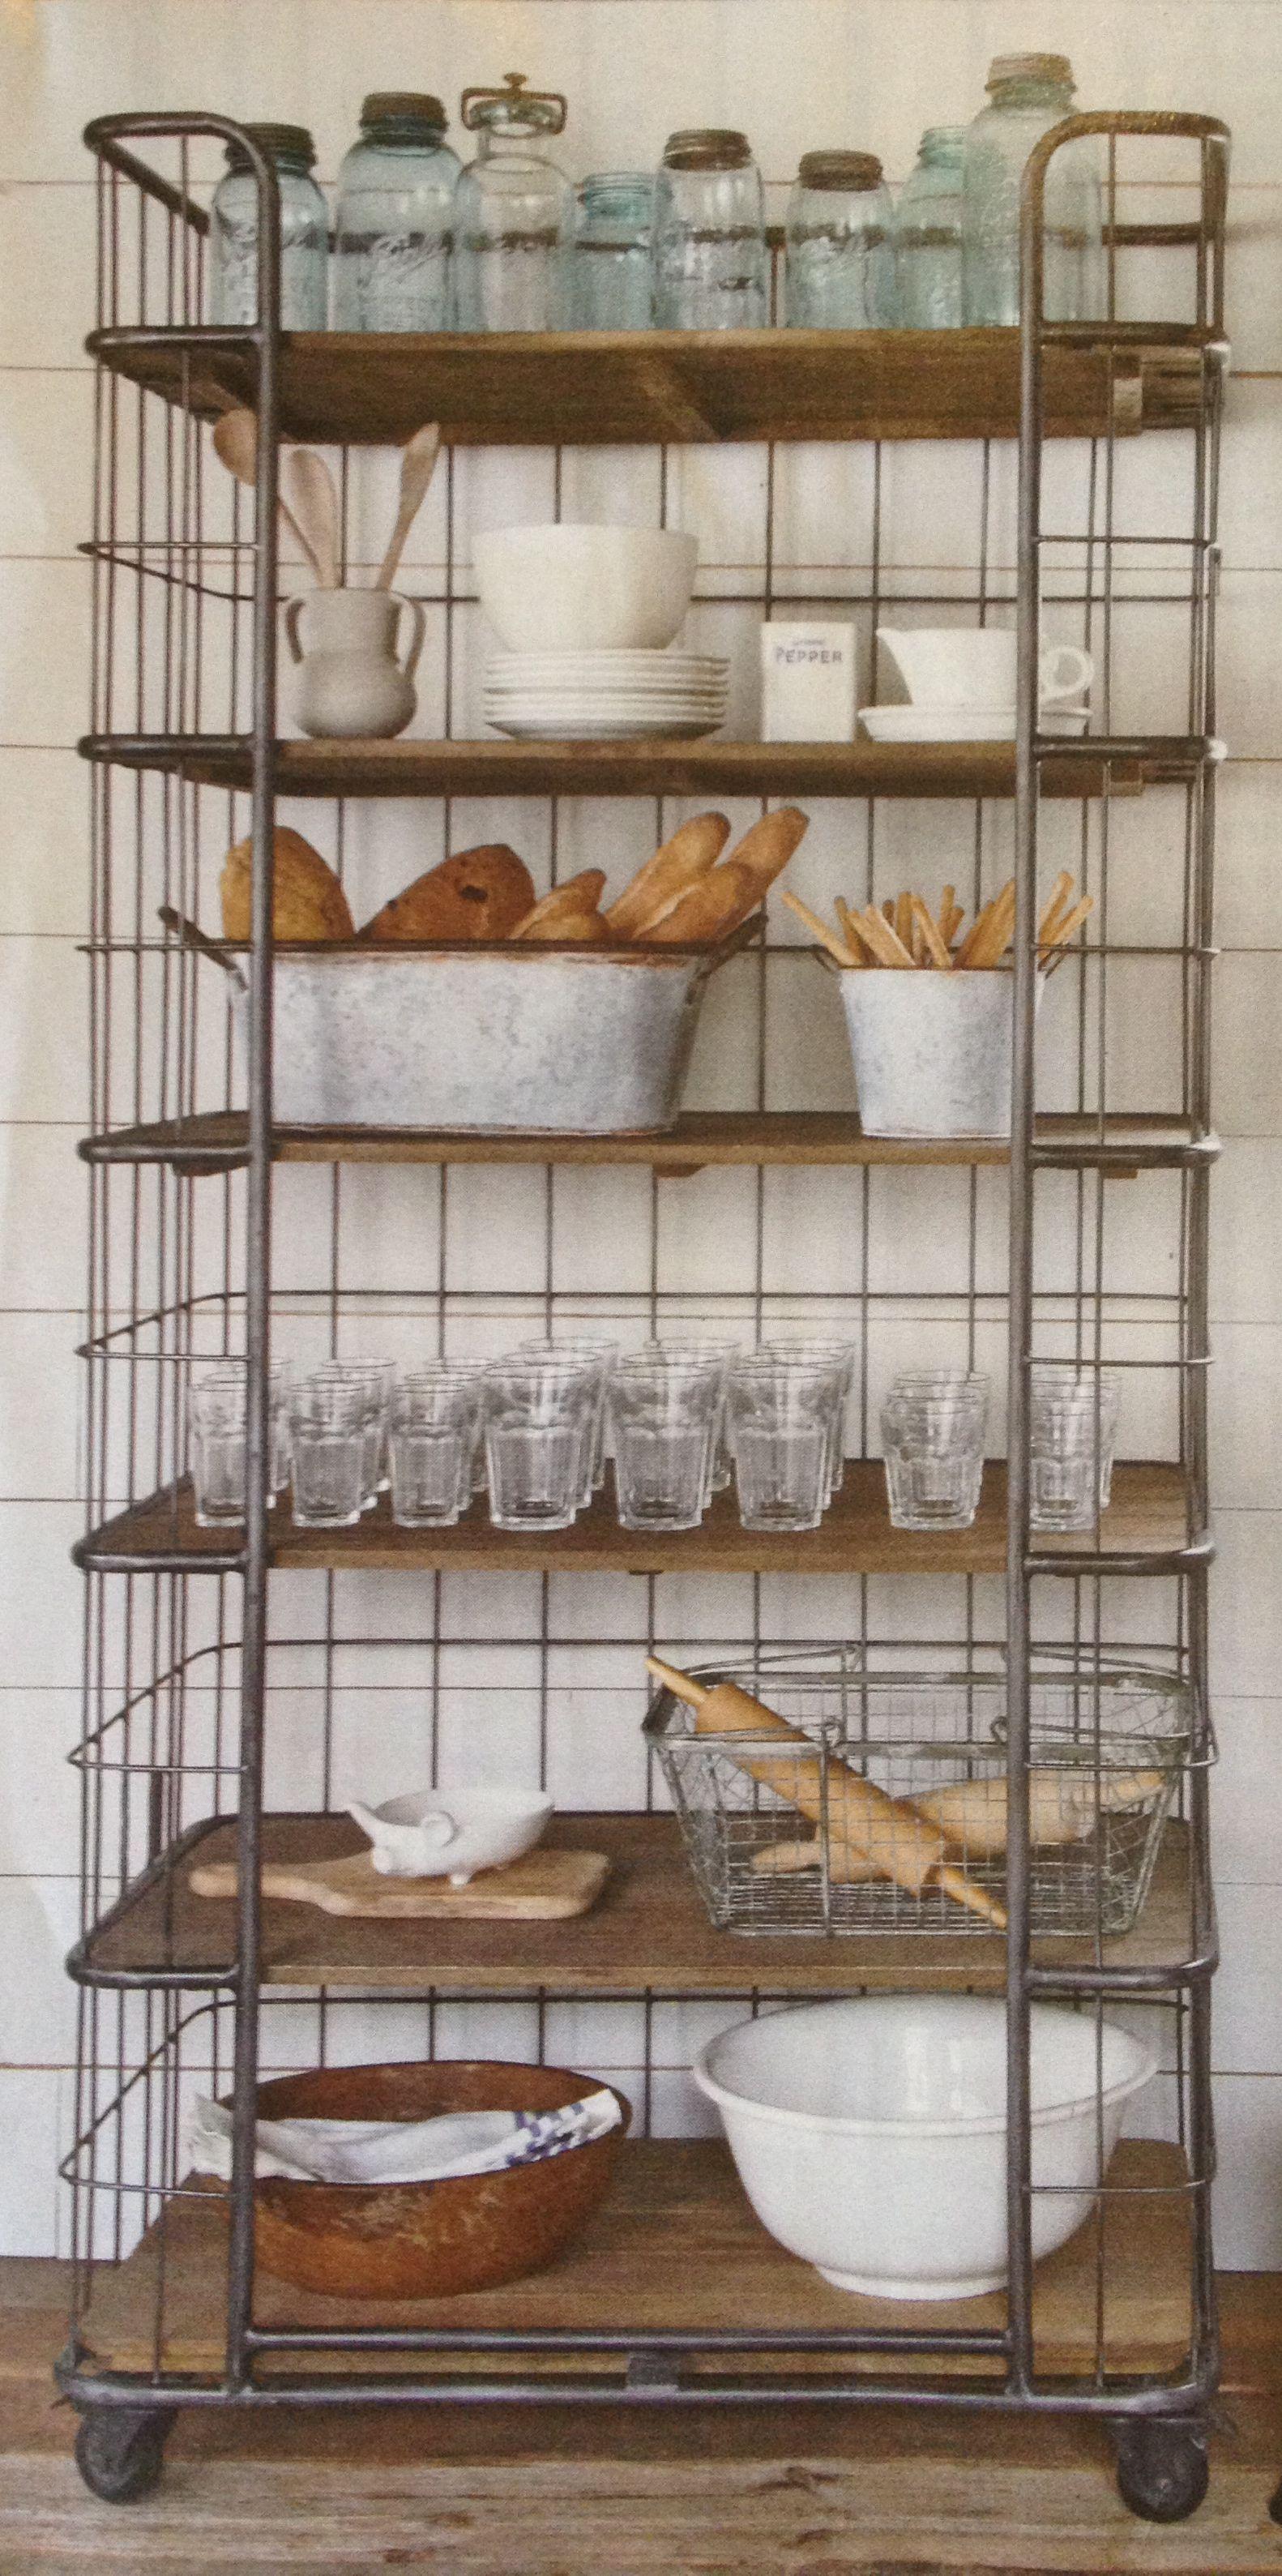 Interesting Shelving Ideas Freestanding Kitchen Free Standing